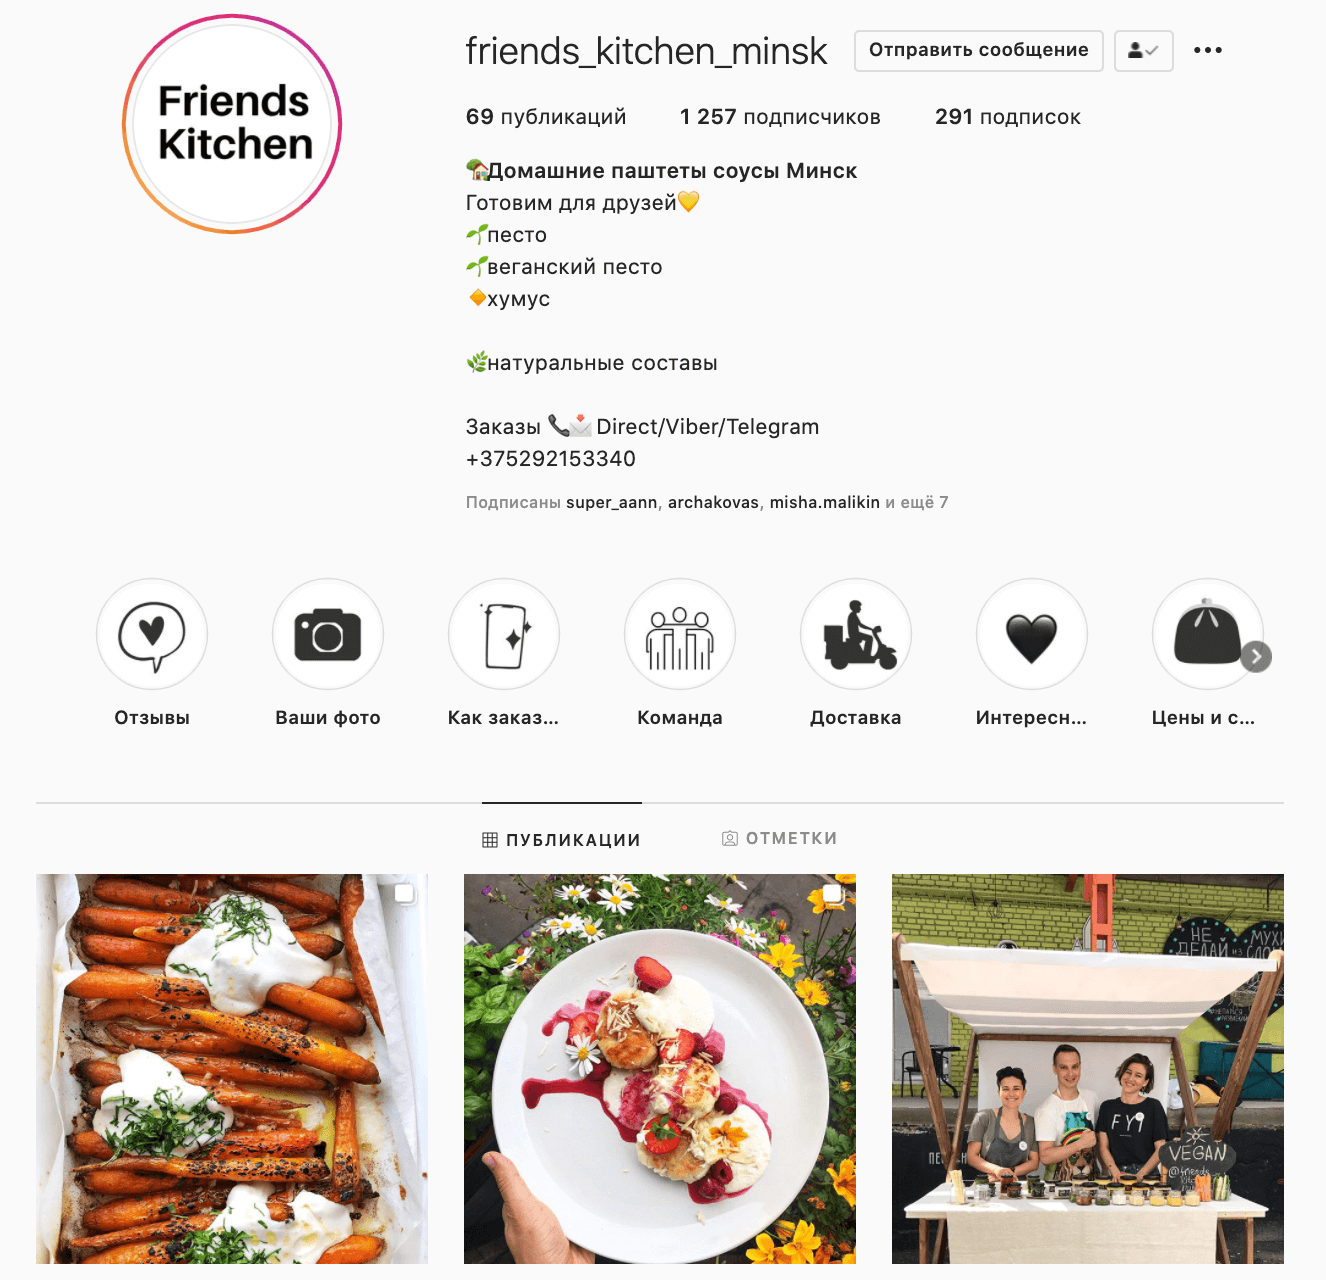 Бренд-аккаунт в Инстаграм @friends_kitchen_minsk